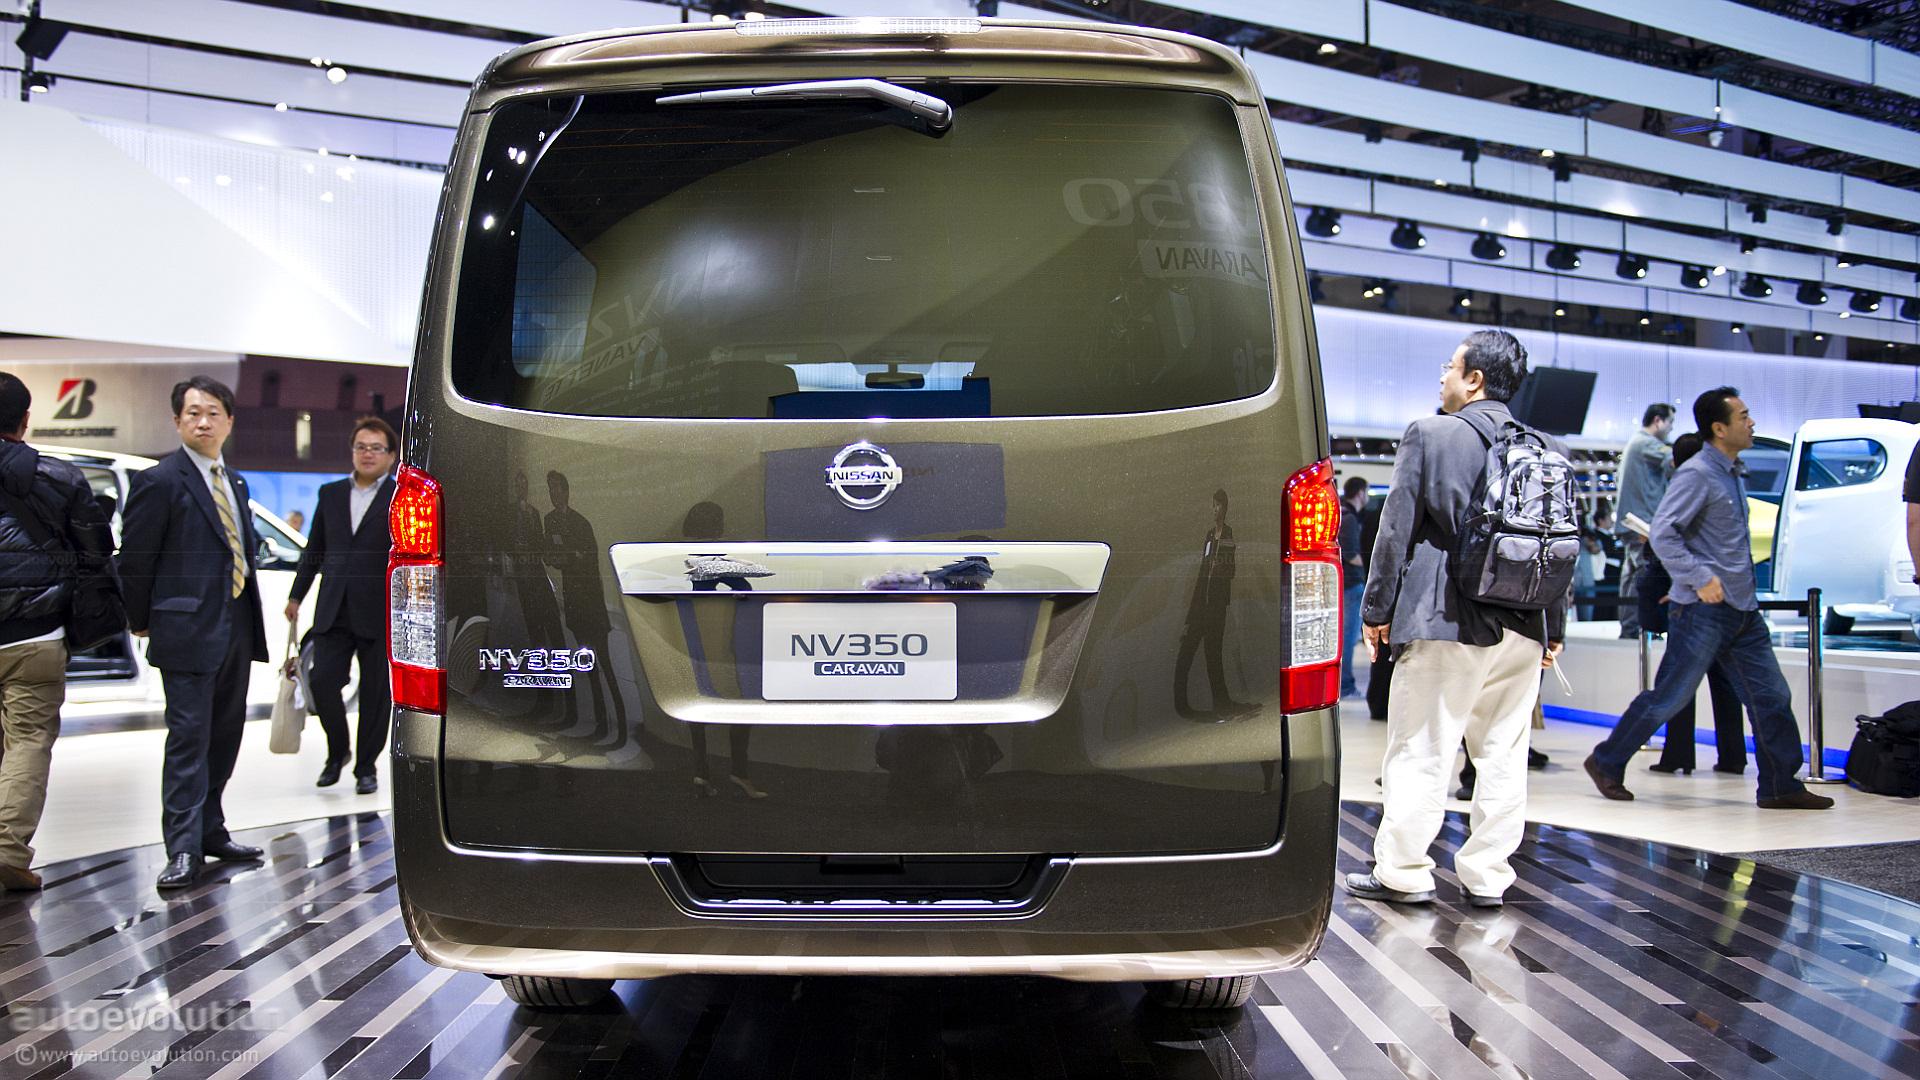 2013 nissan nv350 caravan